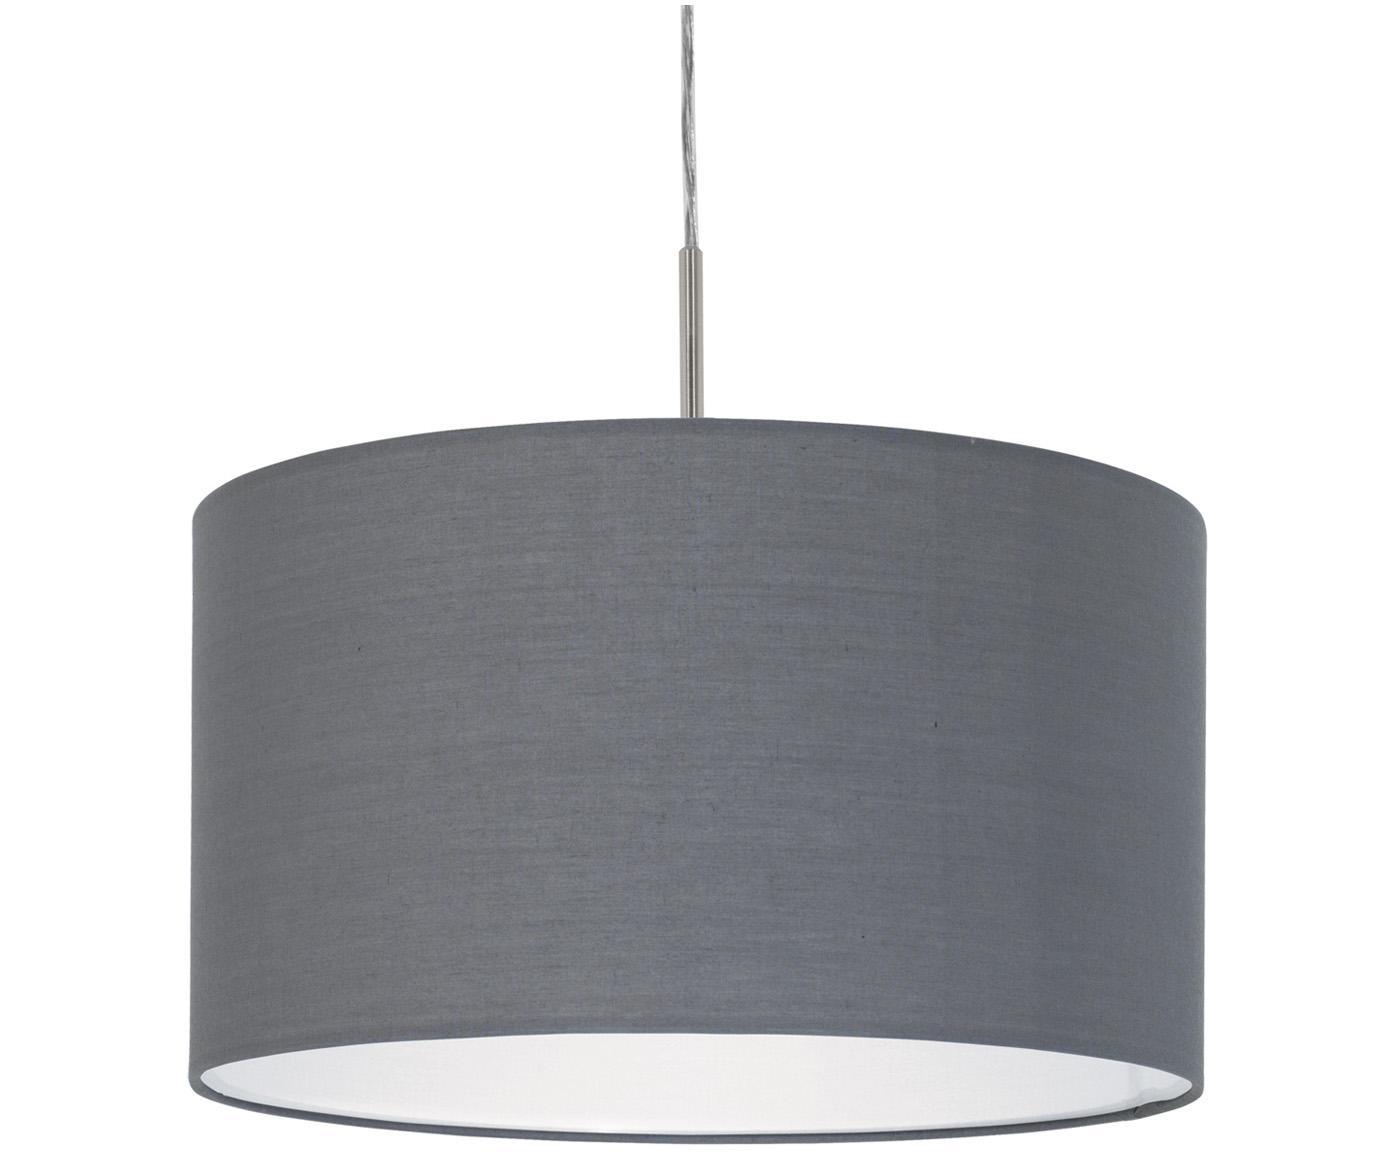 Lampada a sospensione Parry, Baldacchino: metallo, nichelato, Paralume: tessuto, Argentato, grigio, Ø 38 x Alt. 22 cm